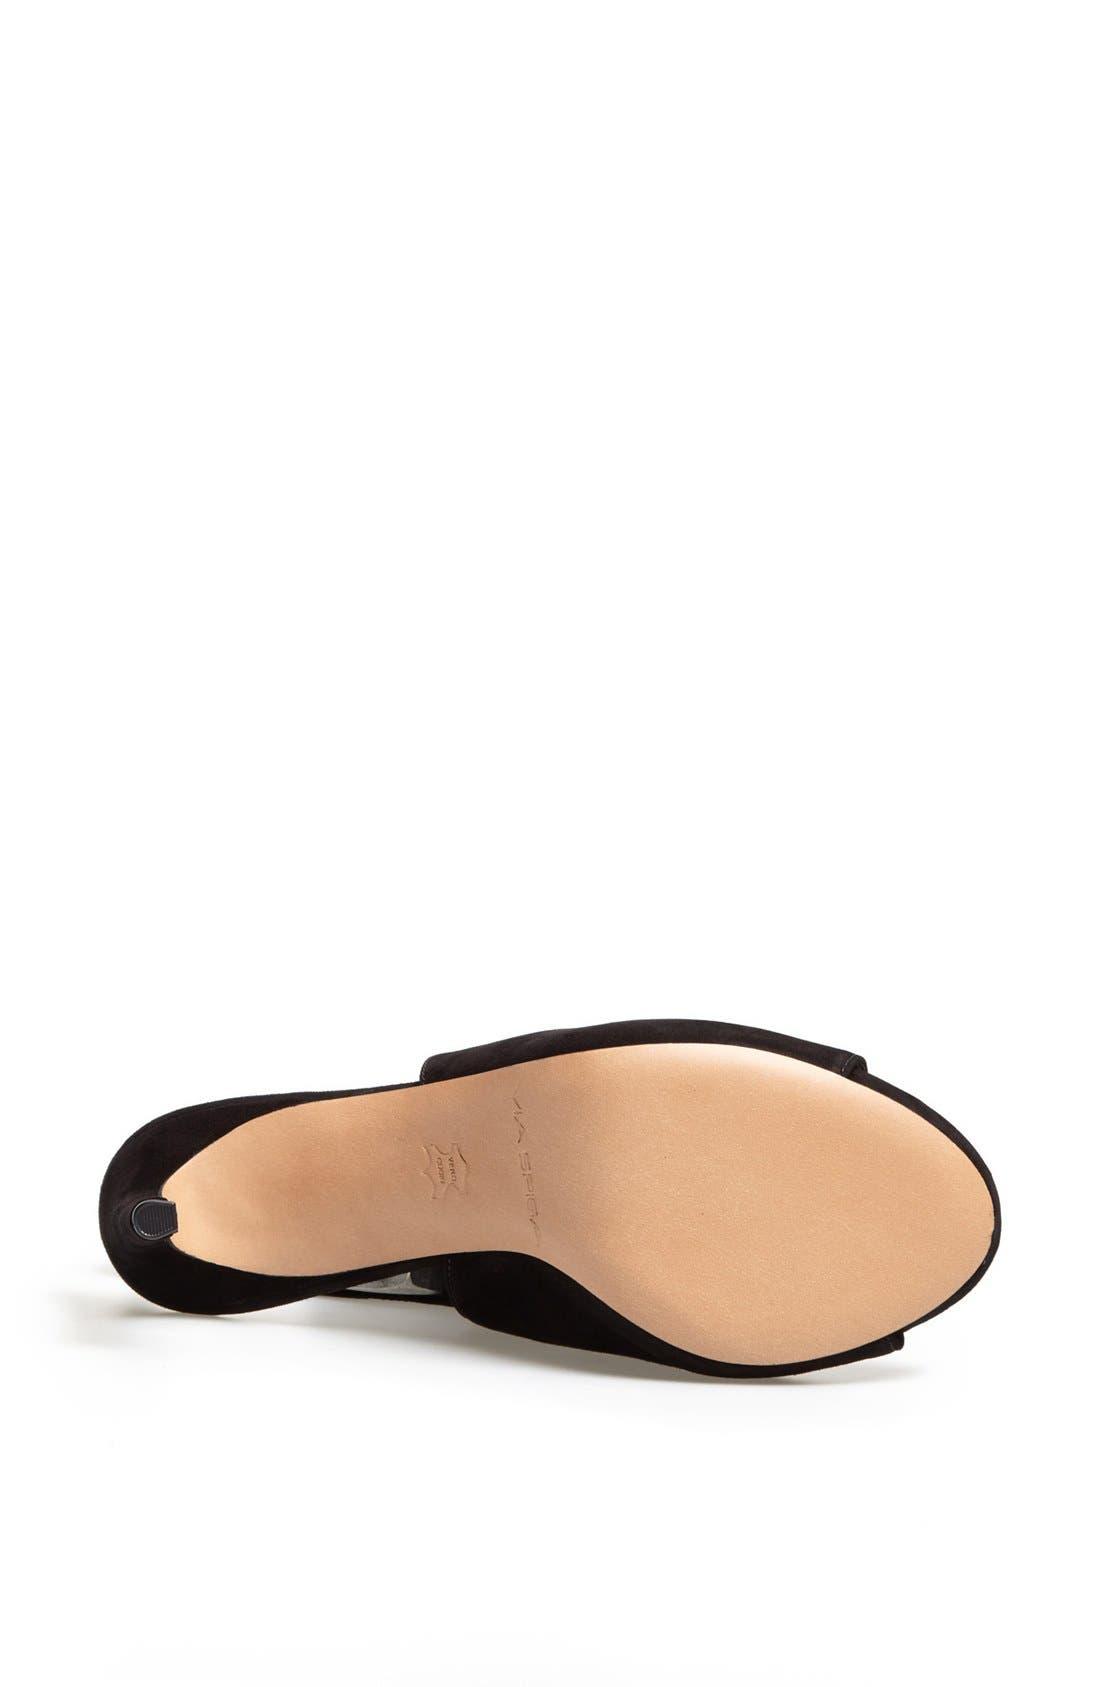 'Nino' Ankle Strap Sandal,                             Alternate thumbnail 2, color,                             002